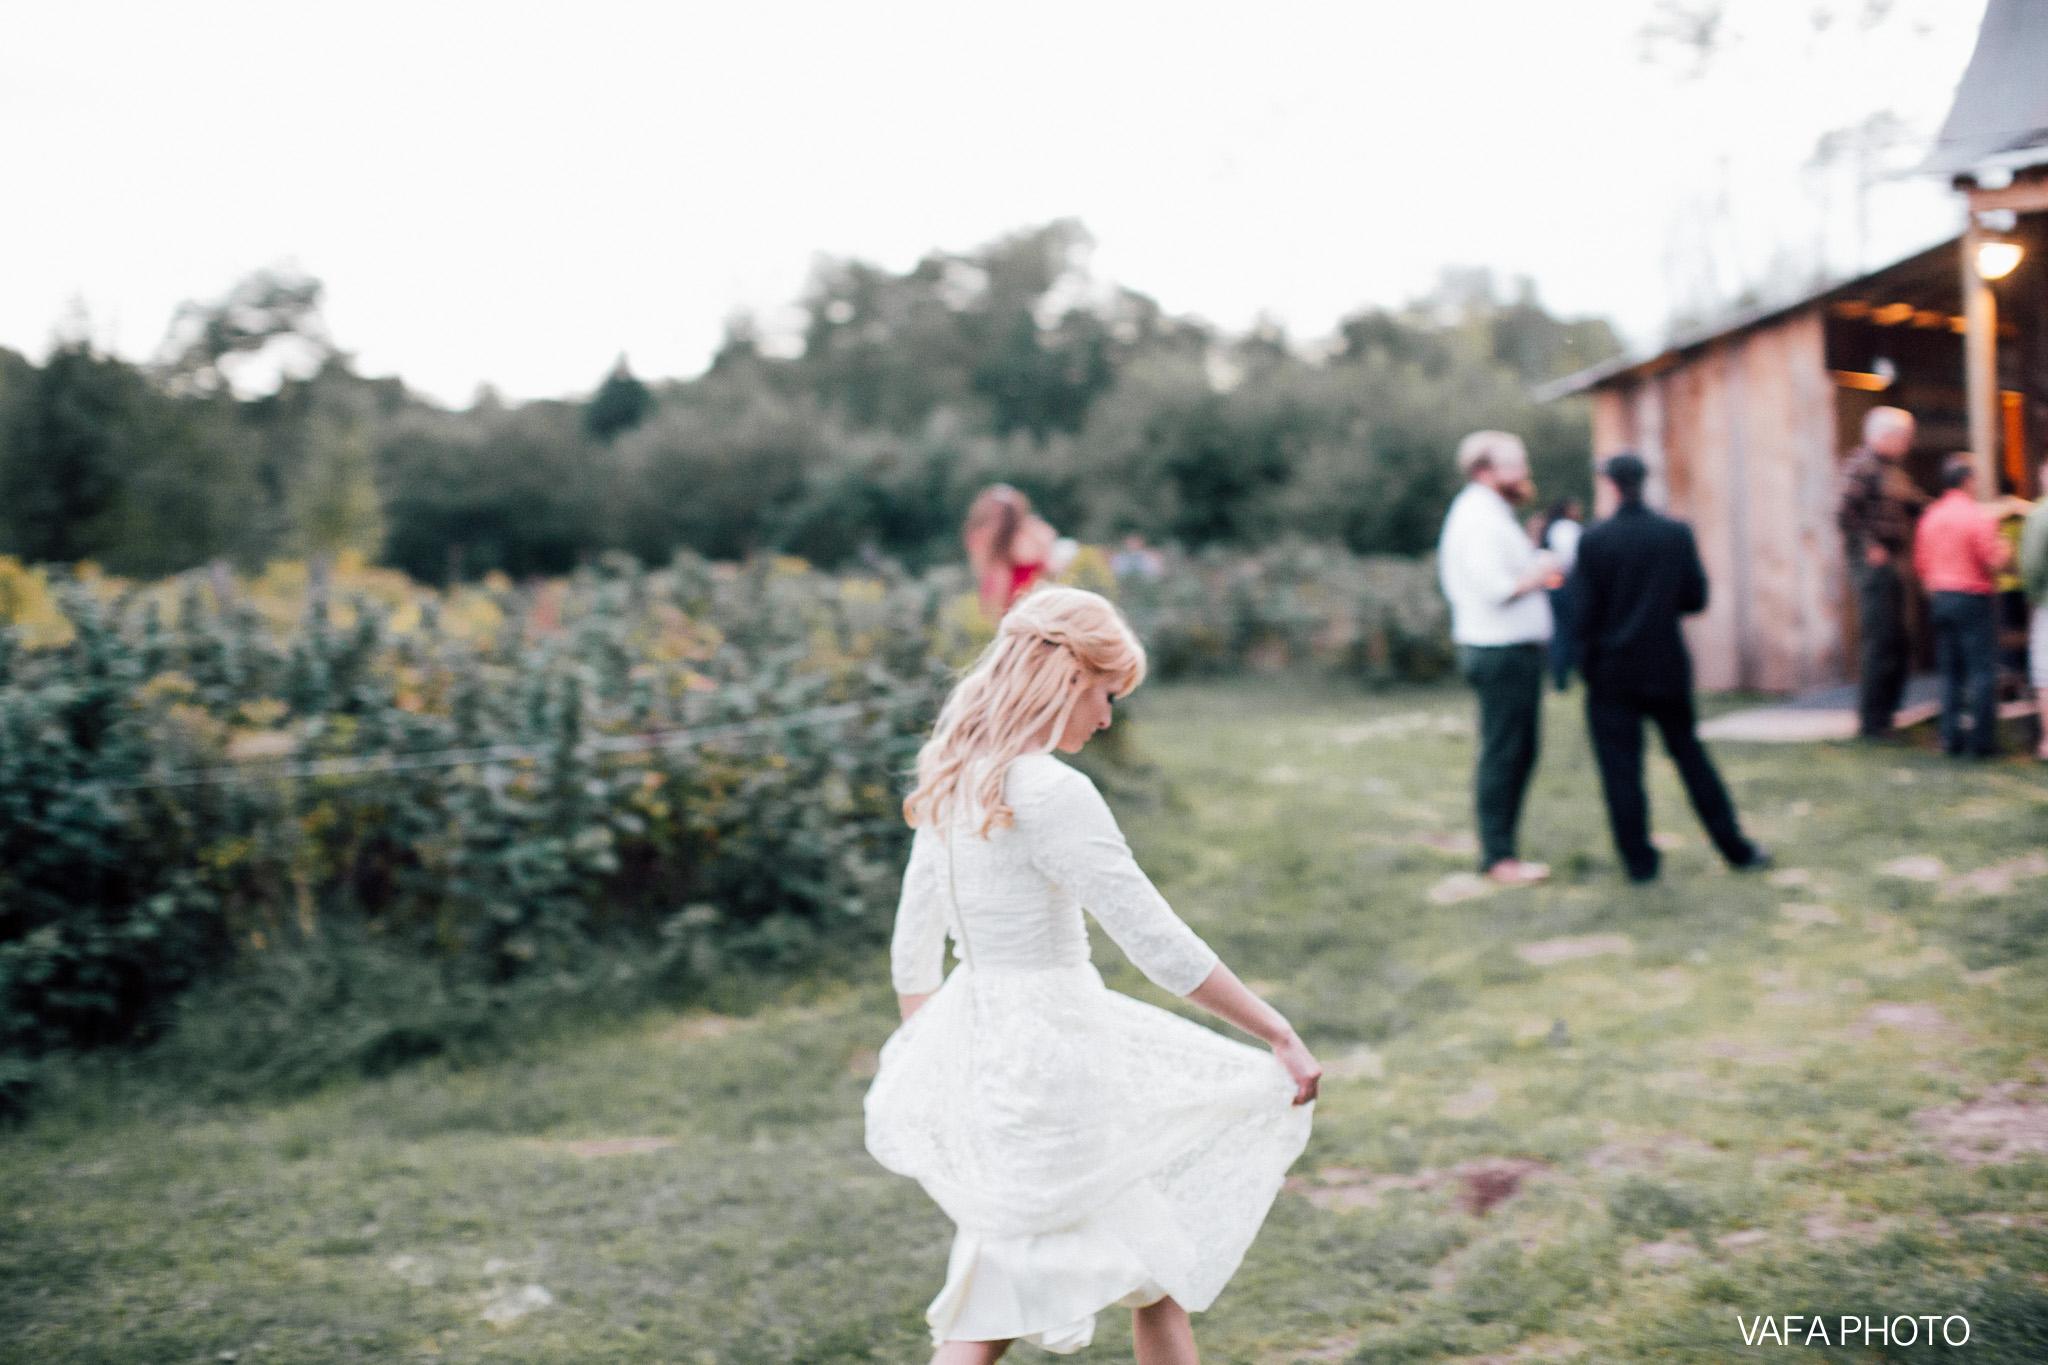 Belsolda-Farm-Wedding-Christy-Eric-Vafa-Photo-751.jpg